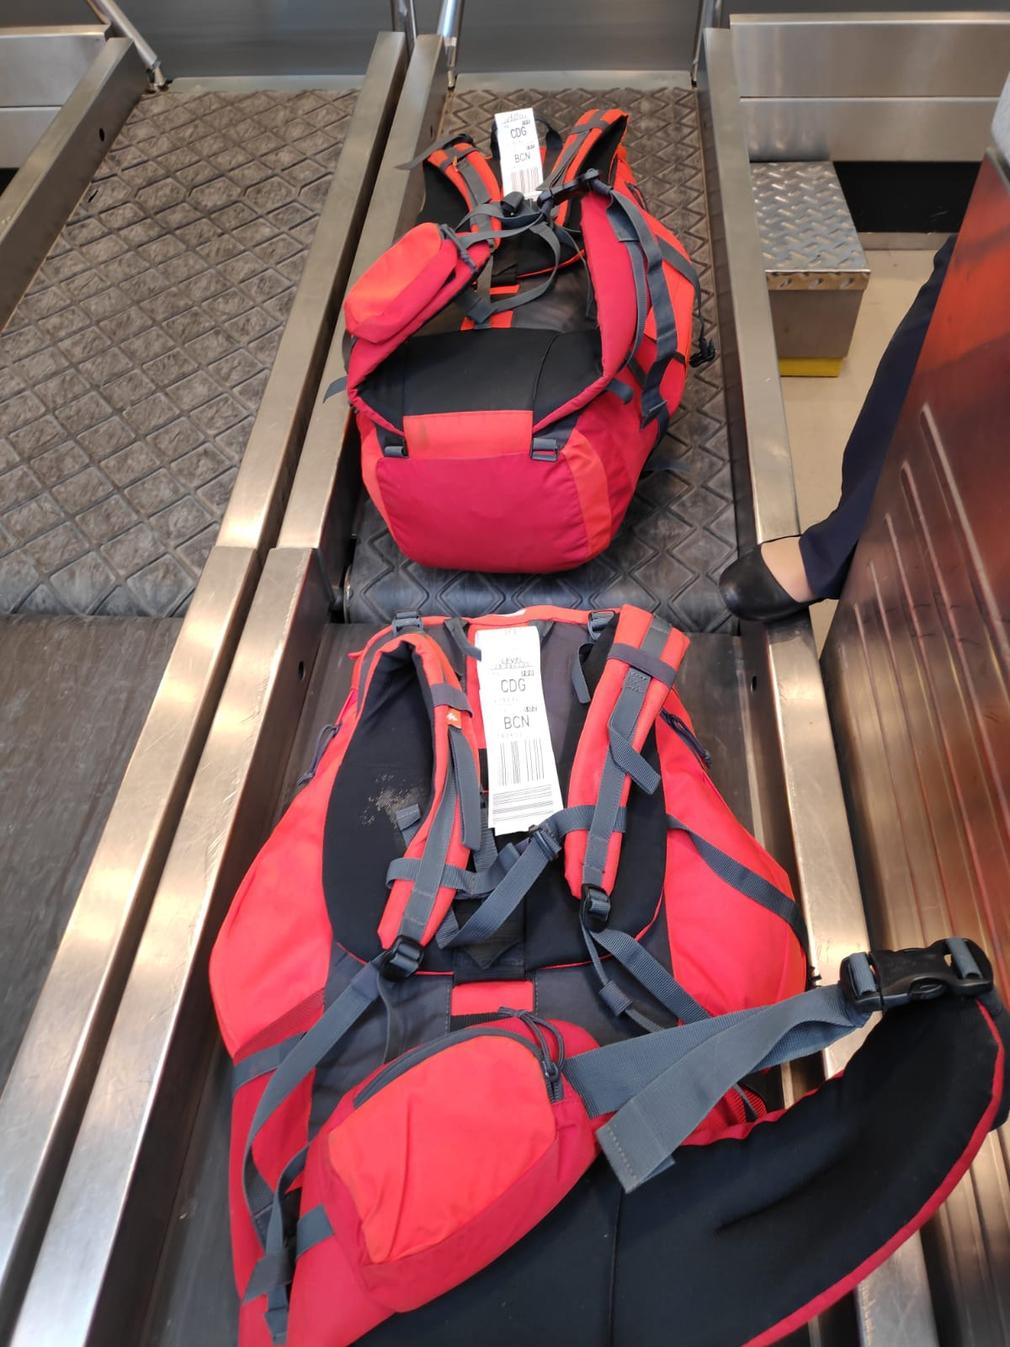 Bags on conveyor belt